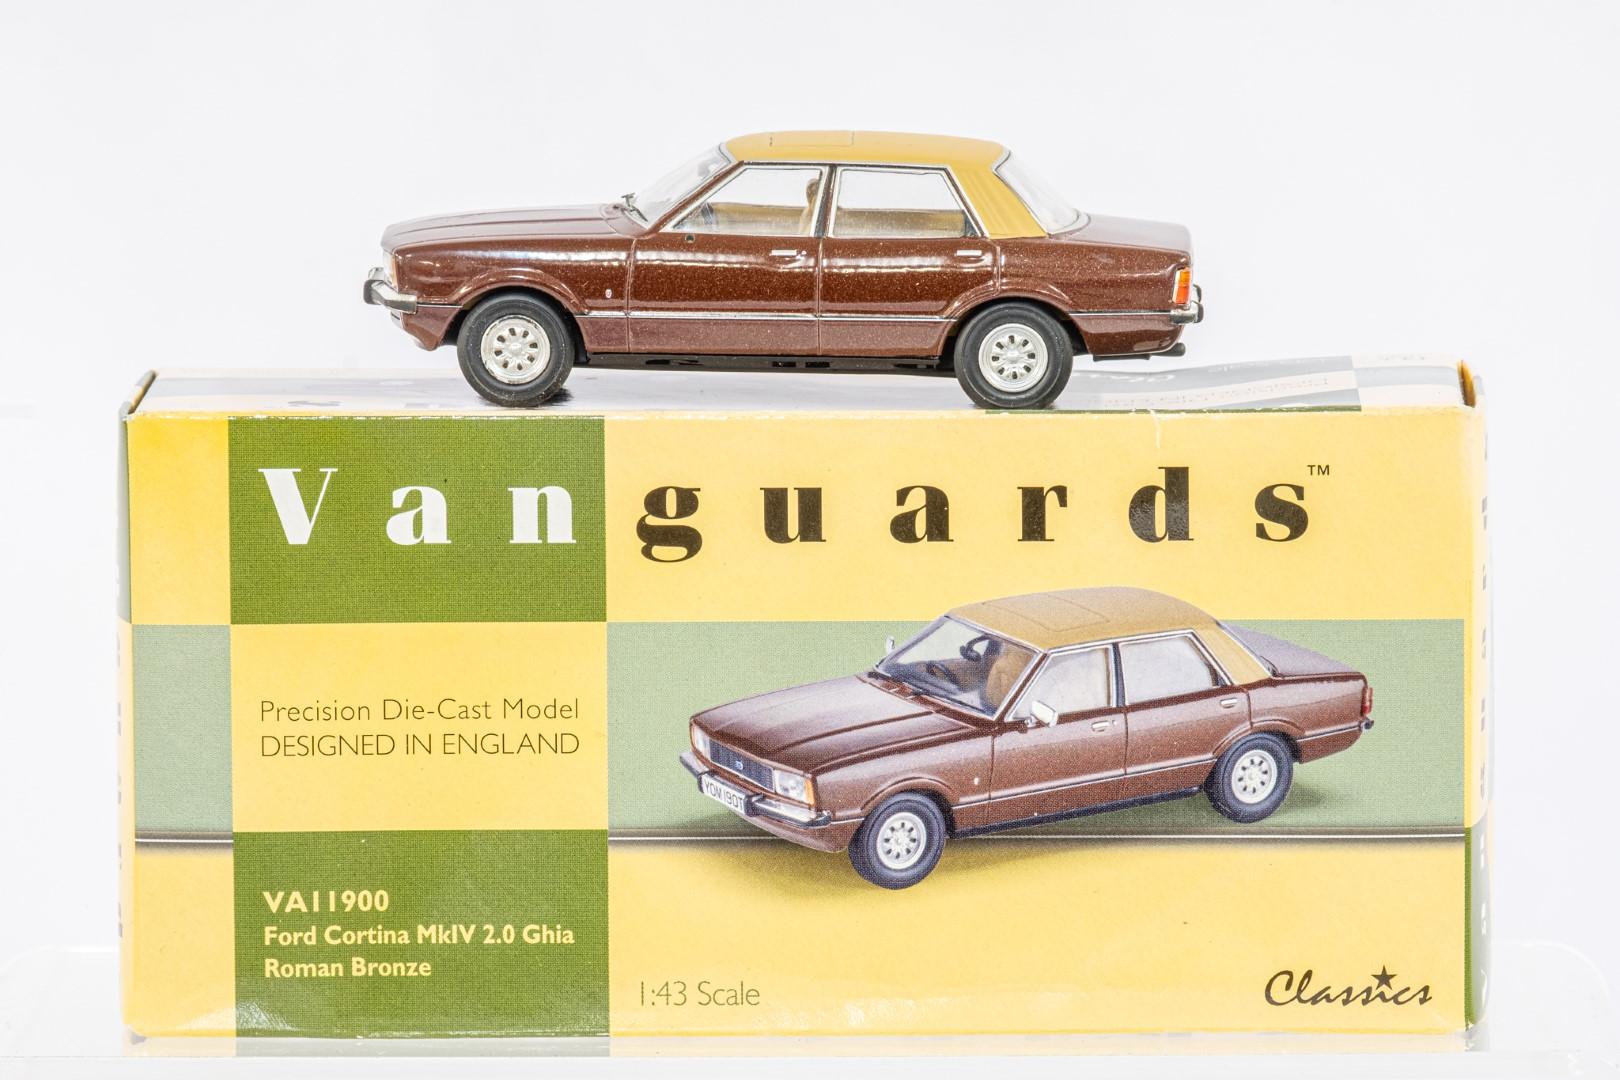 Vanguards Ford Cortina MkIV 2.0 Ghia Roman Bronze - Wolseley Six - Cosmic Blue Metallic - - Image 3 of 3